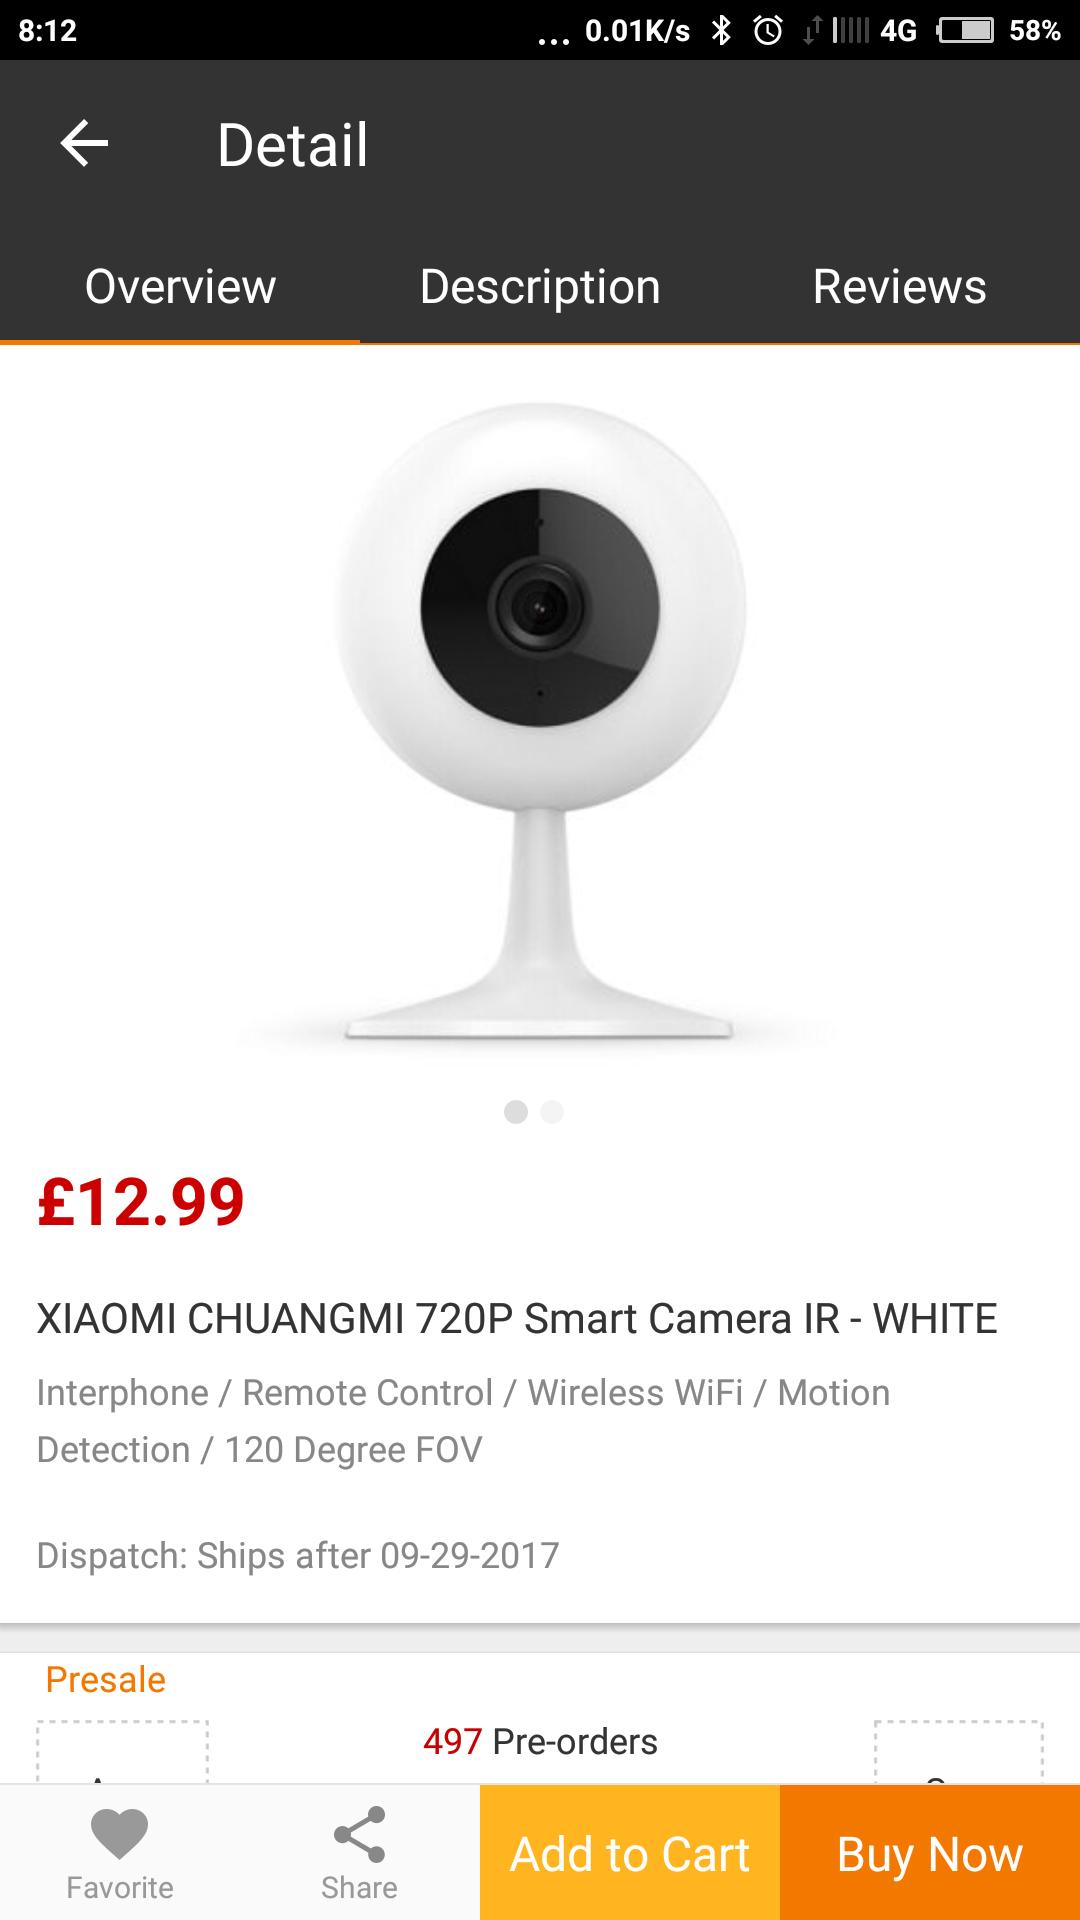 Xiaomi chuangmi IP camera £12.99 at gearbest